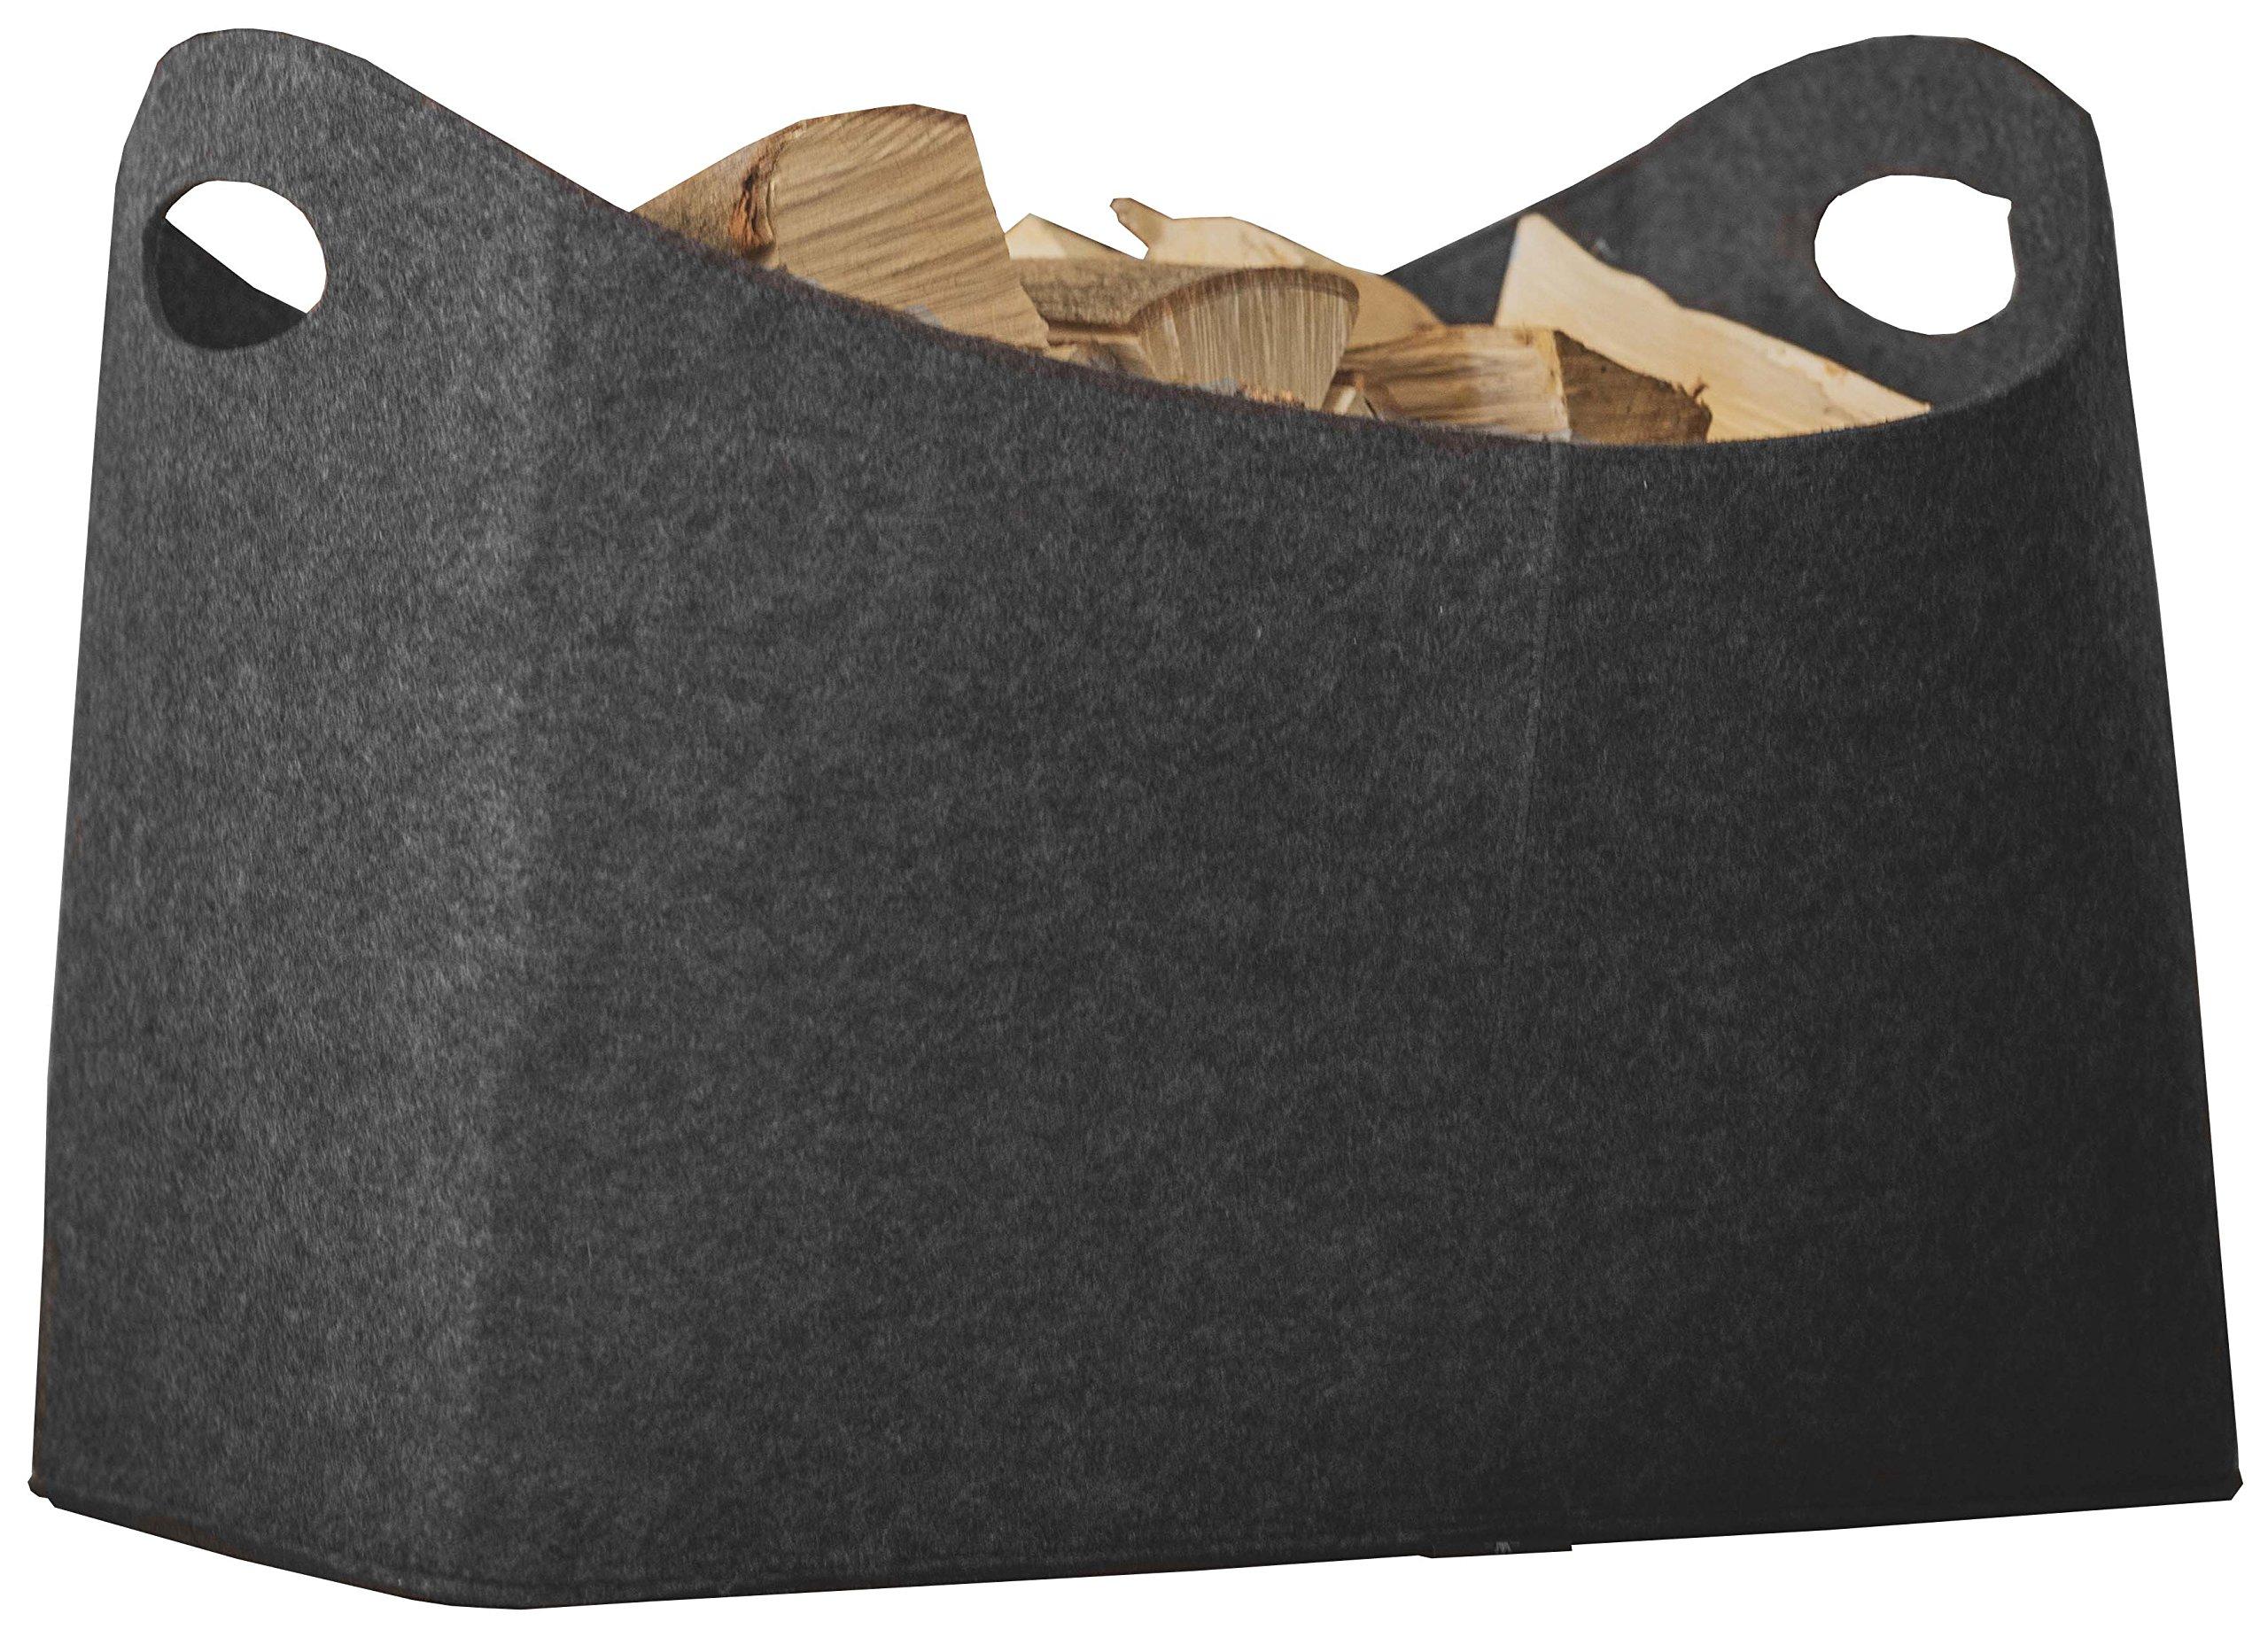 Rubberneck Cesta de leña, fieltro, multiusos, dimensiones 54 x 39 x 30 cm (Antracite)